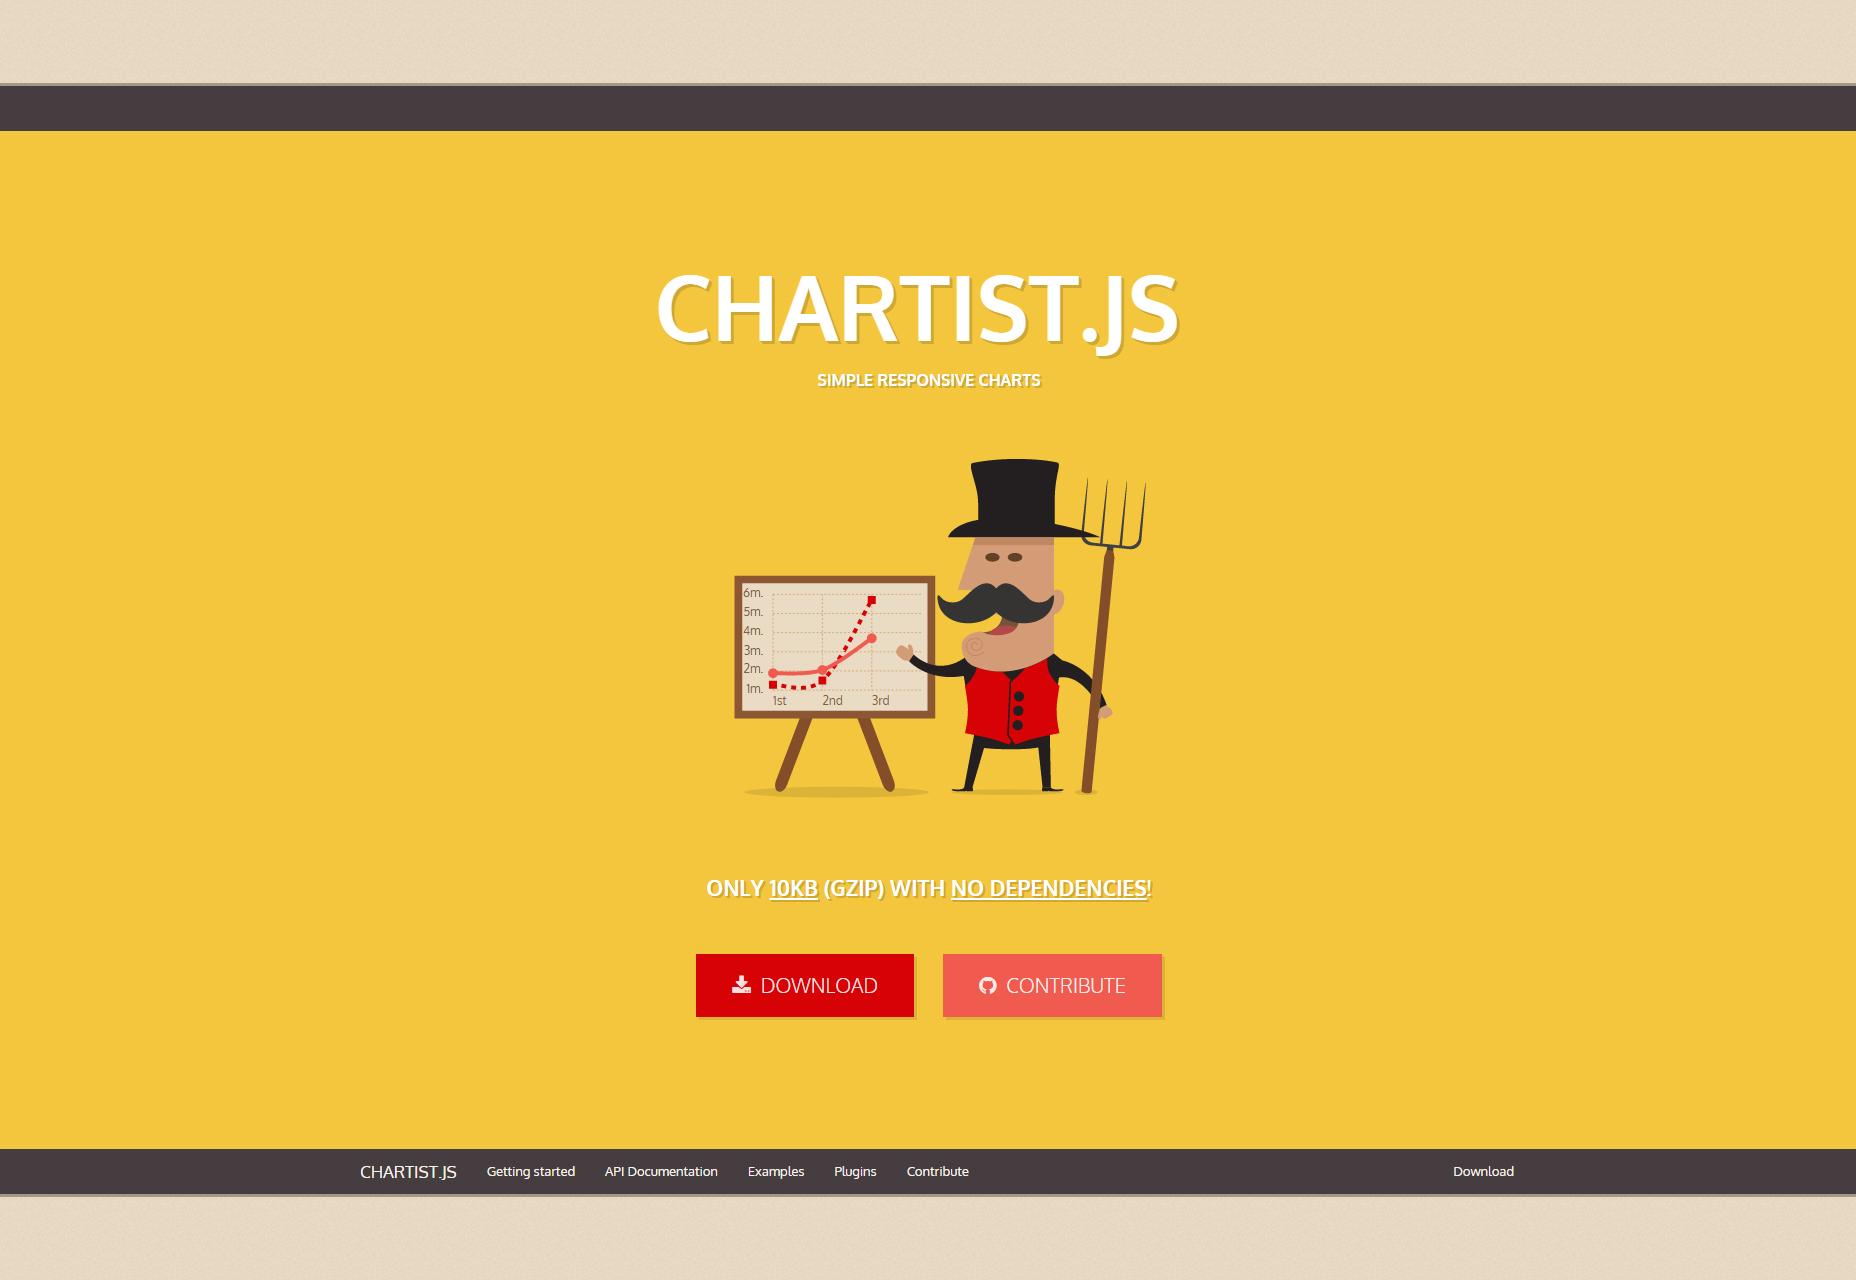 Chartist.js: Flat Responsive Charts